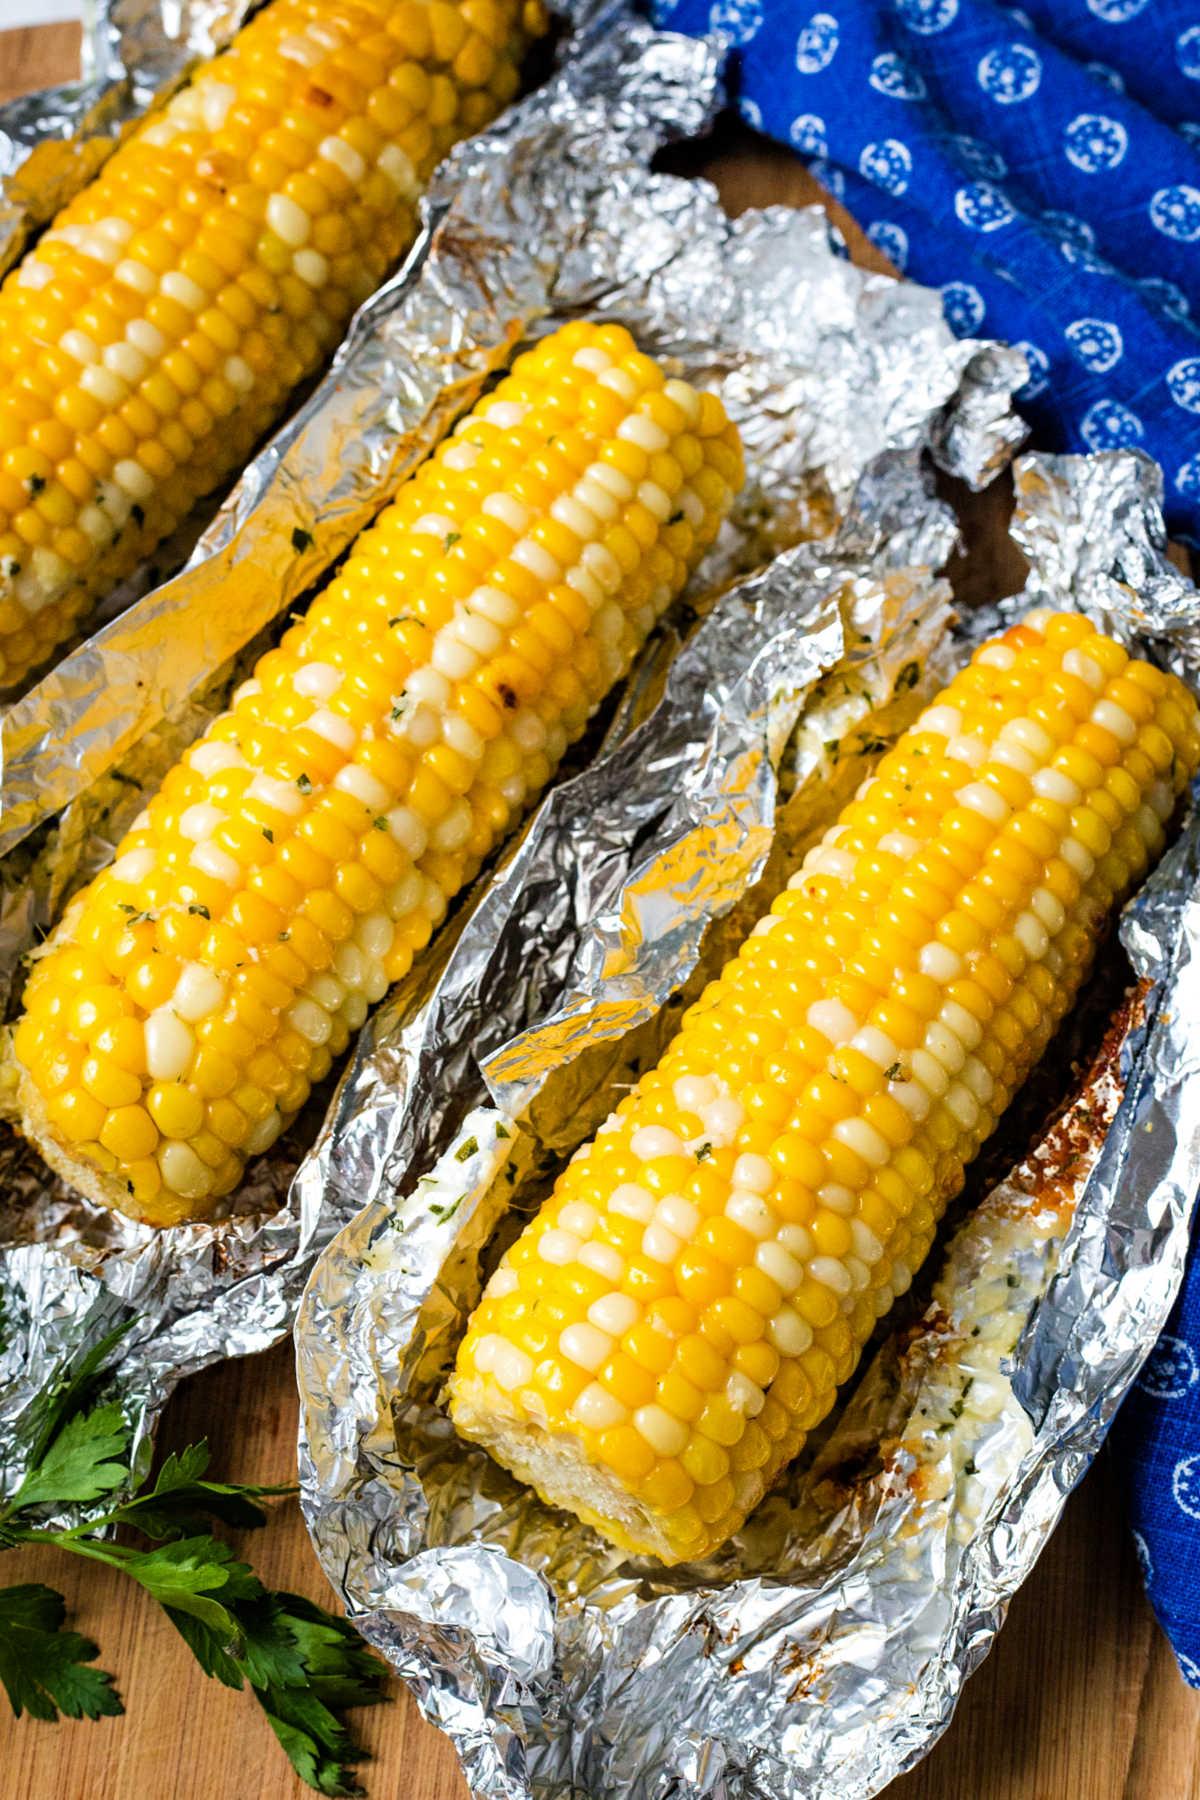 3 unwrapped ears of grill corn in foil on a wooden board.